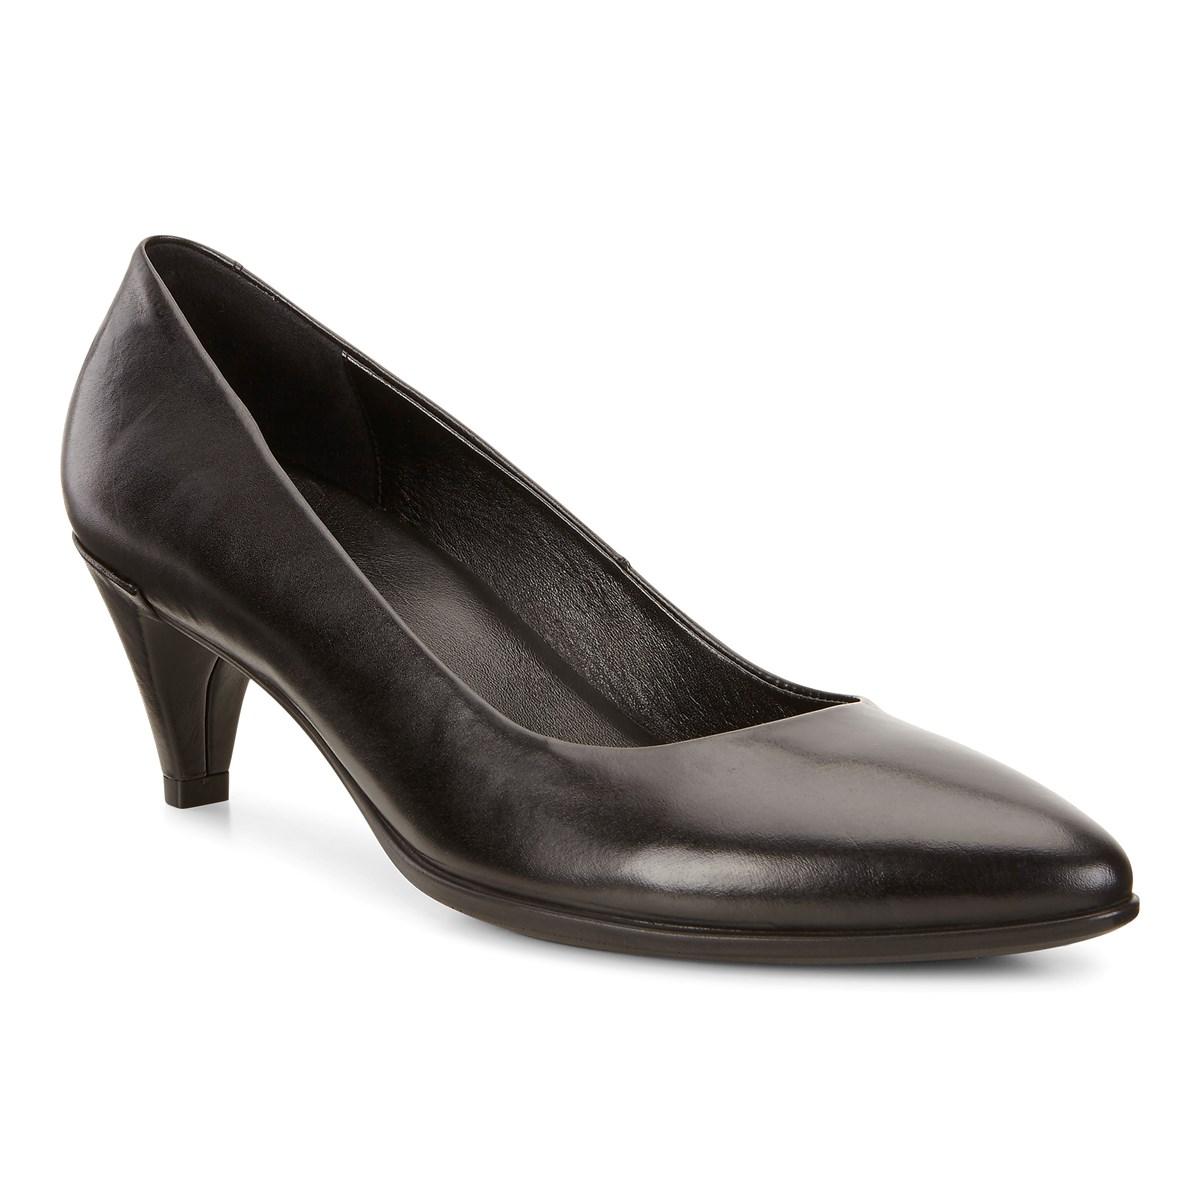 6992571d414 Shop Womens - SHAPE 45 POINTY SLEEK - ECCO Shoes NZ